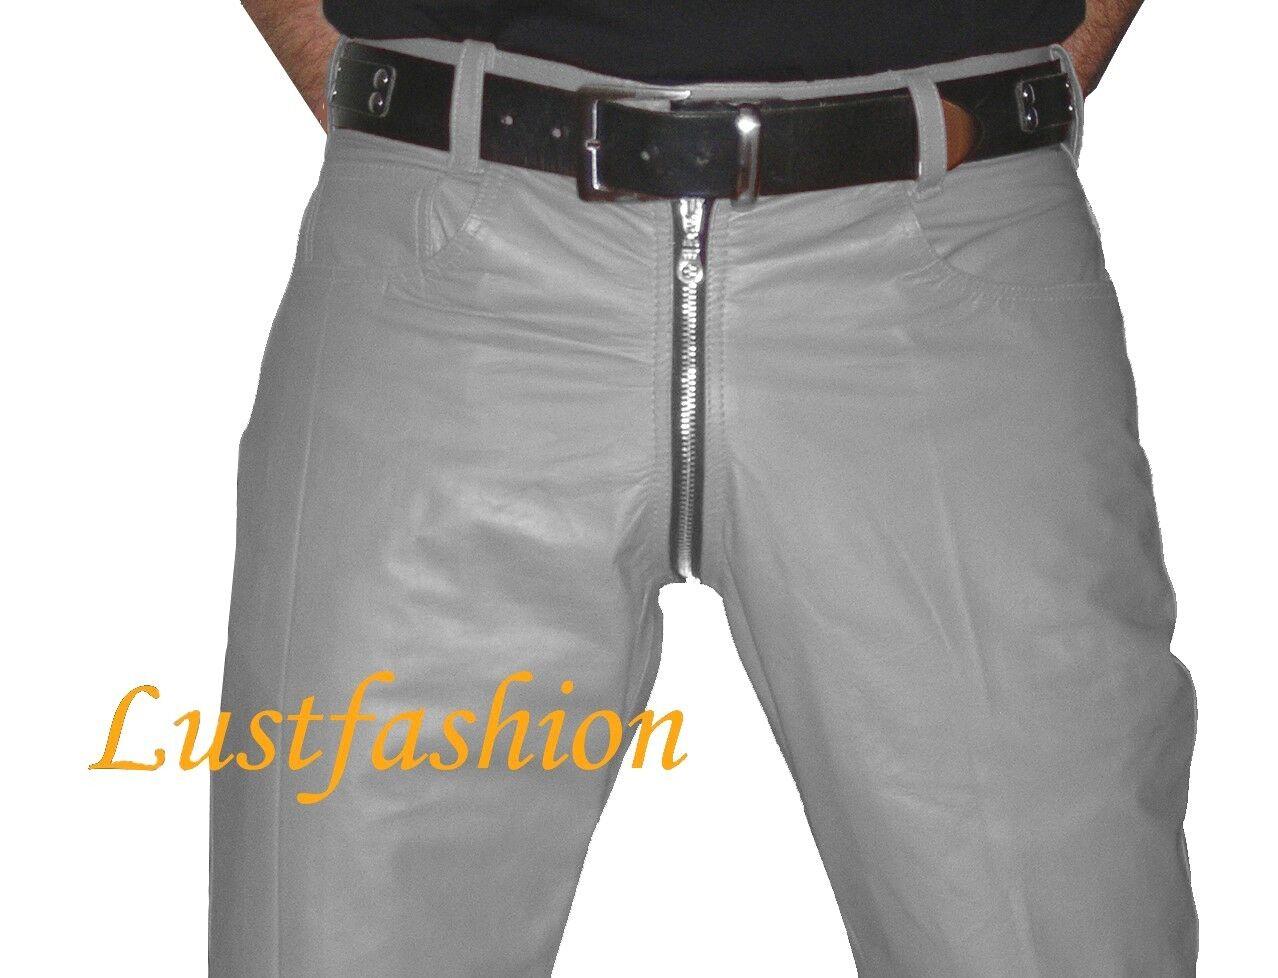 LEDERHOSE grau durchgehender Zip Lederjeans  gay leather trousers pants grau